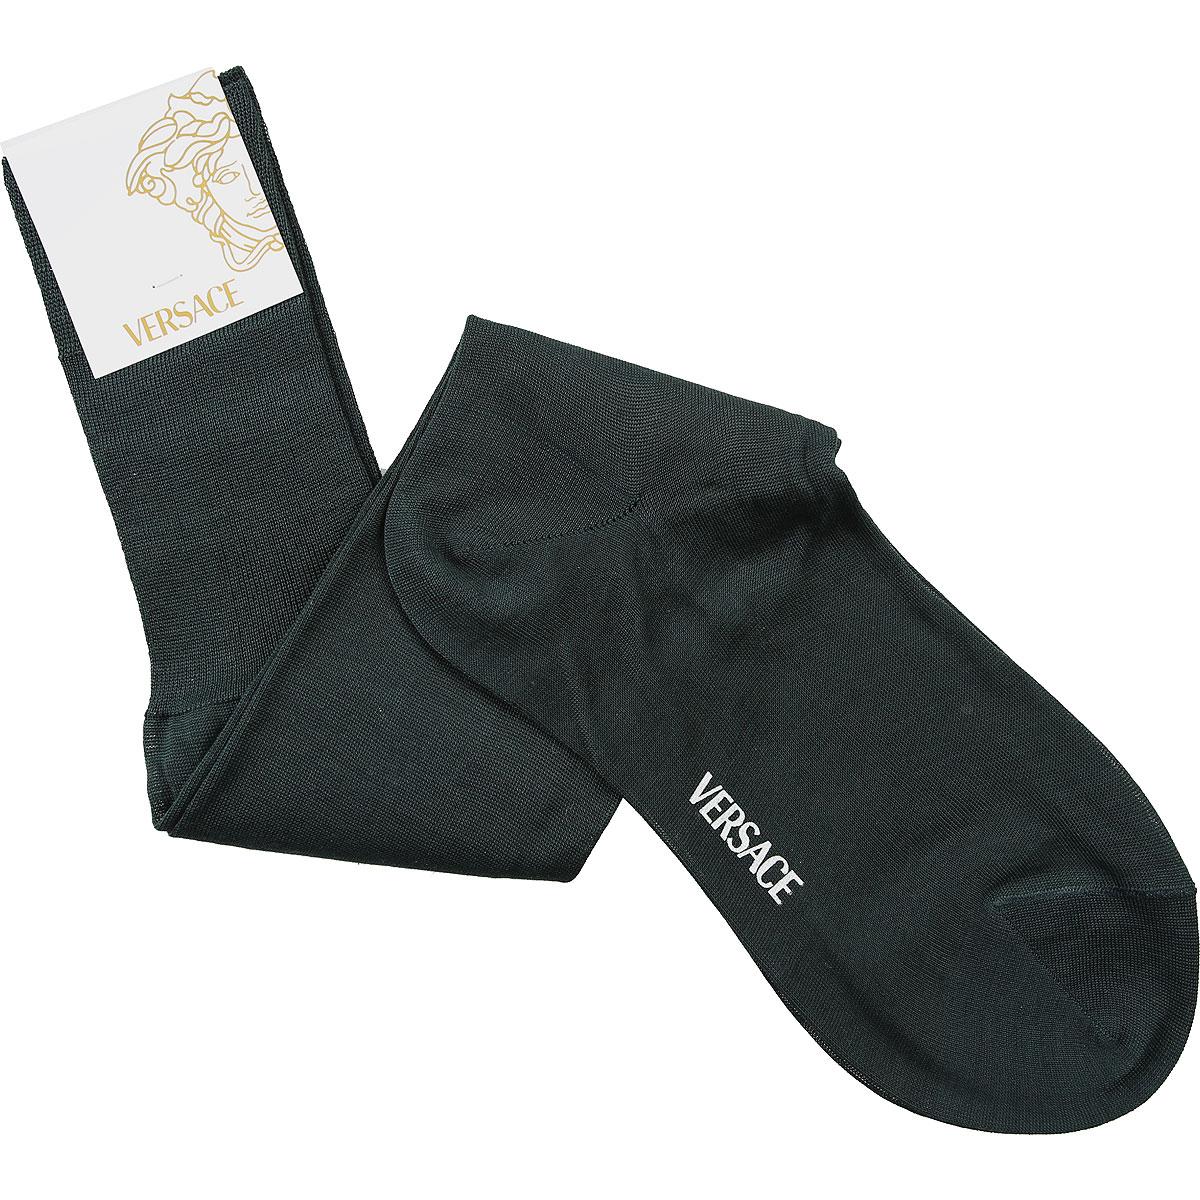 Versace Socks Socks for Men On Sale in Outlet, Dark Green, Lisle Cotton Thread, 2019, 10.5 (Shoe Size: EU 42.5 - US 8.5) 11.5 (Shoe Size: EU 43.5 - US